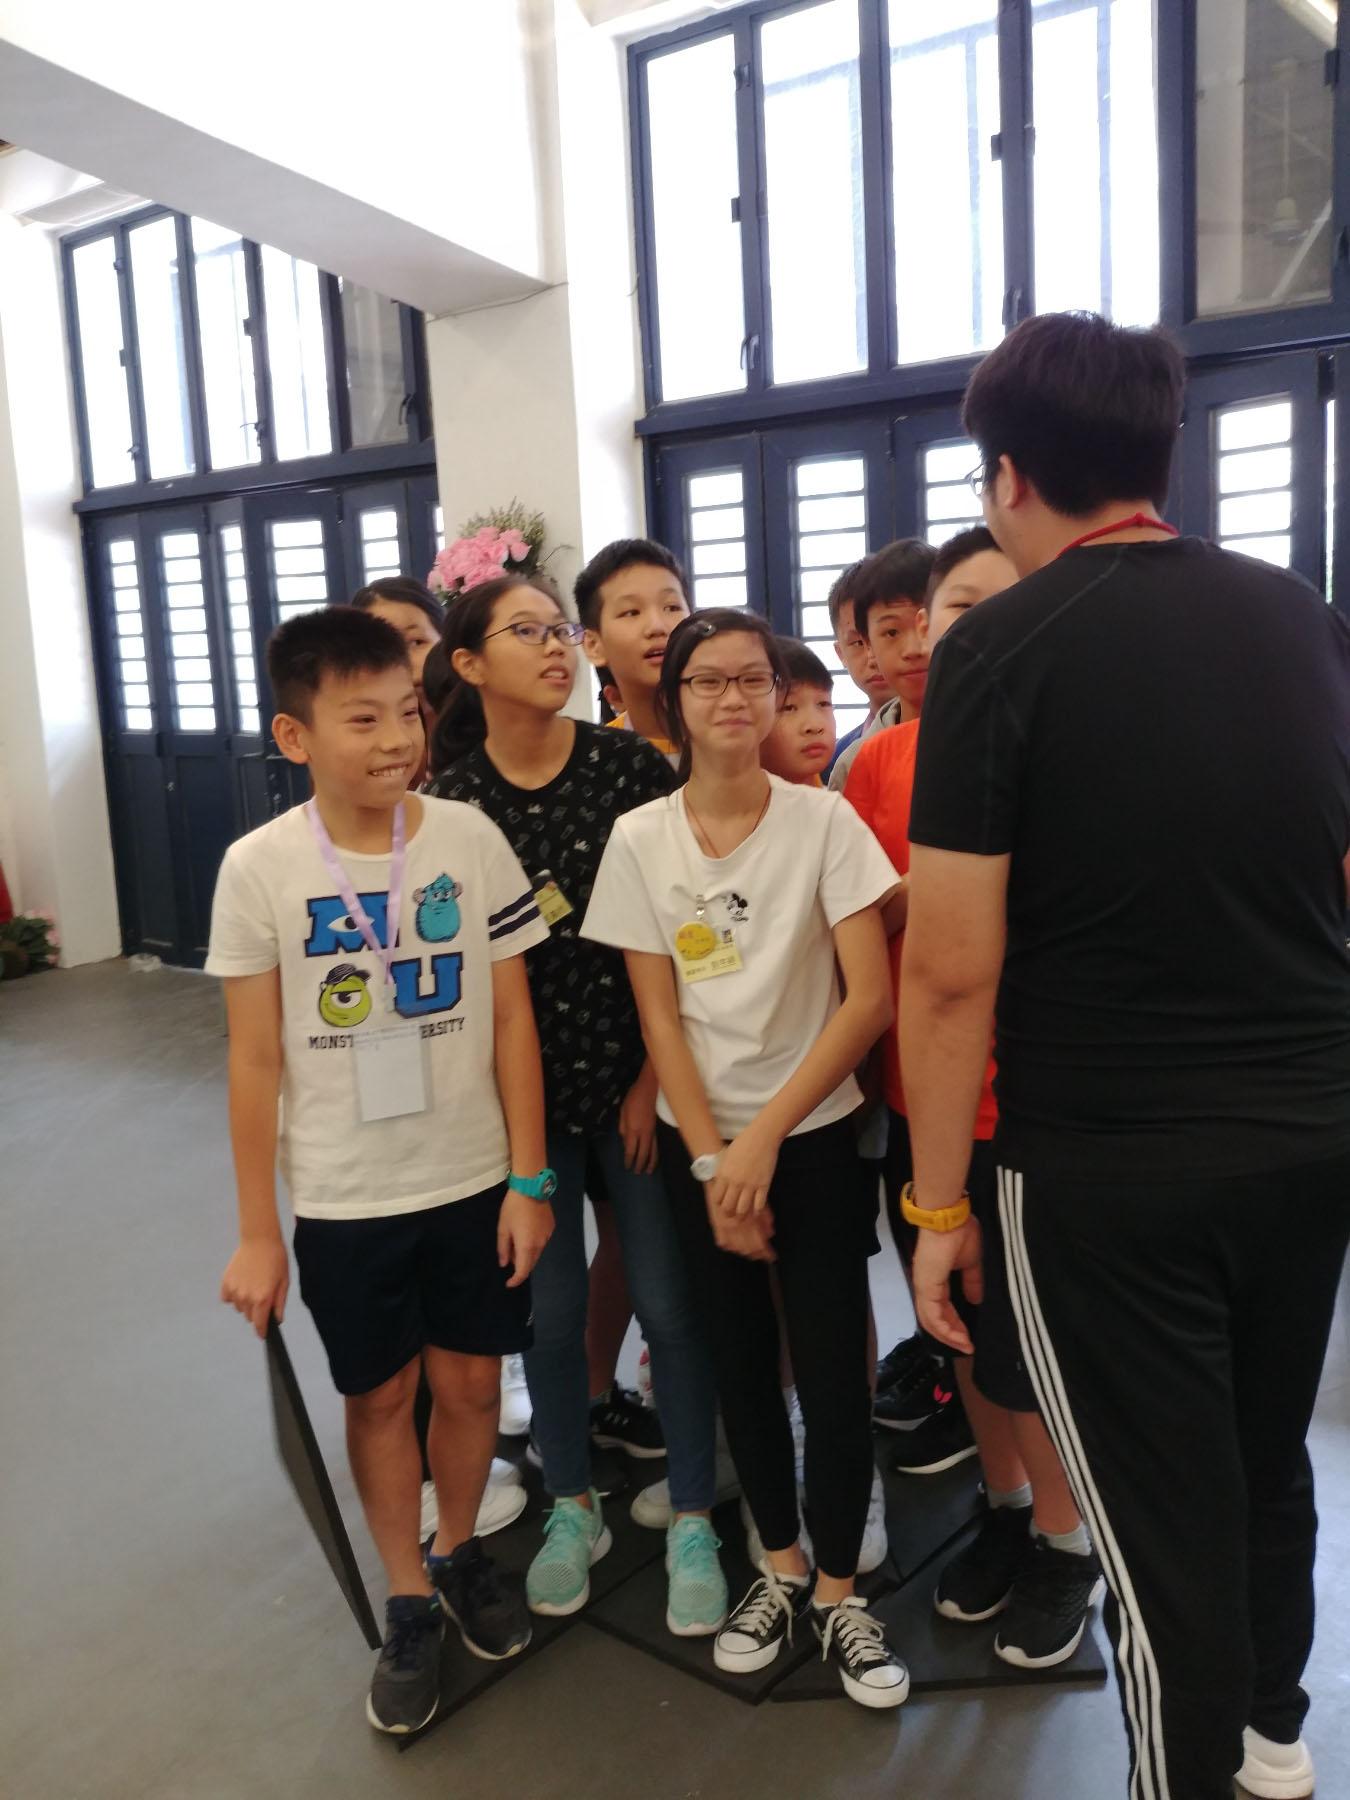 https://npc.edu.hk/sites/default/files/20190814_105956.jpg